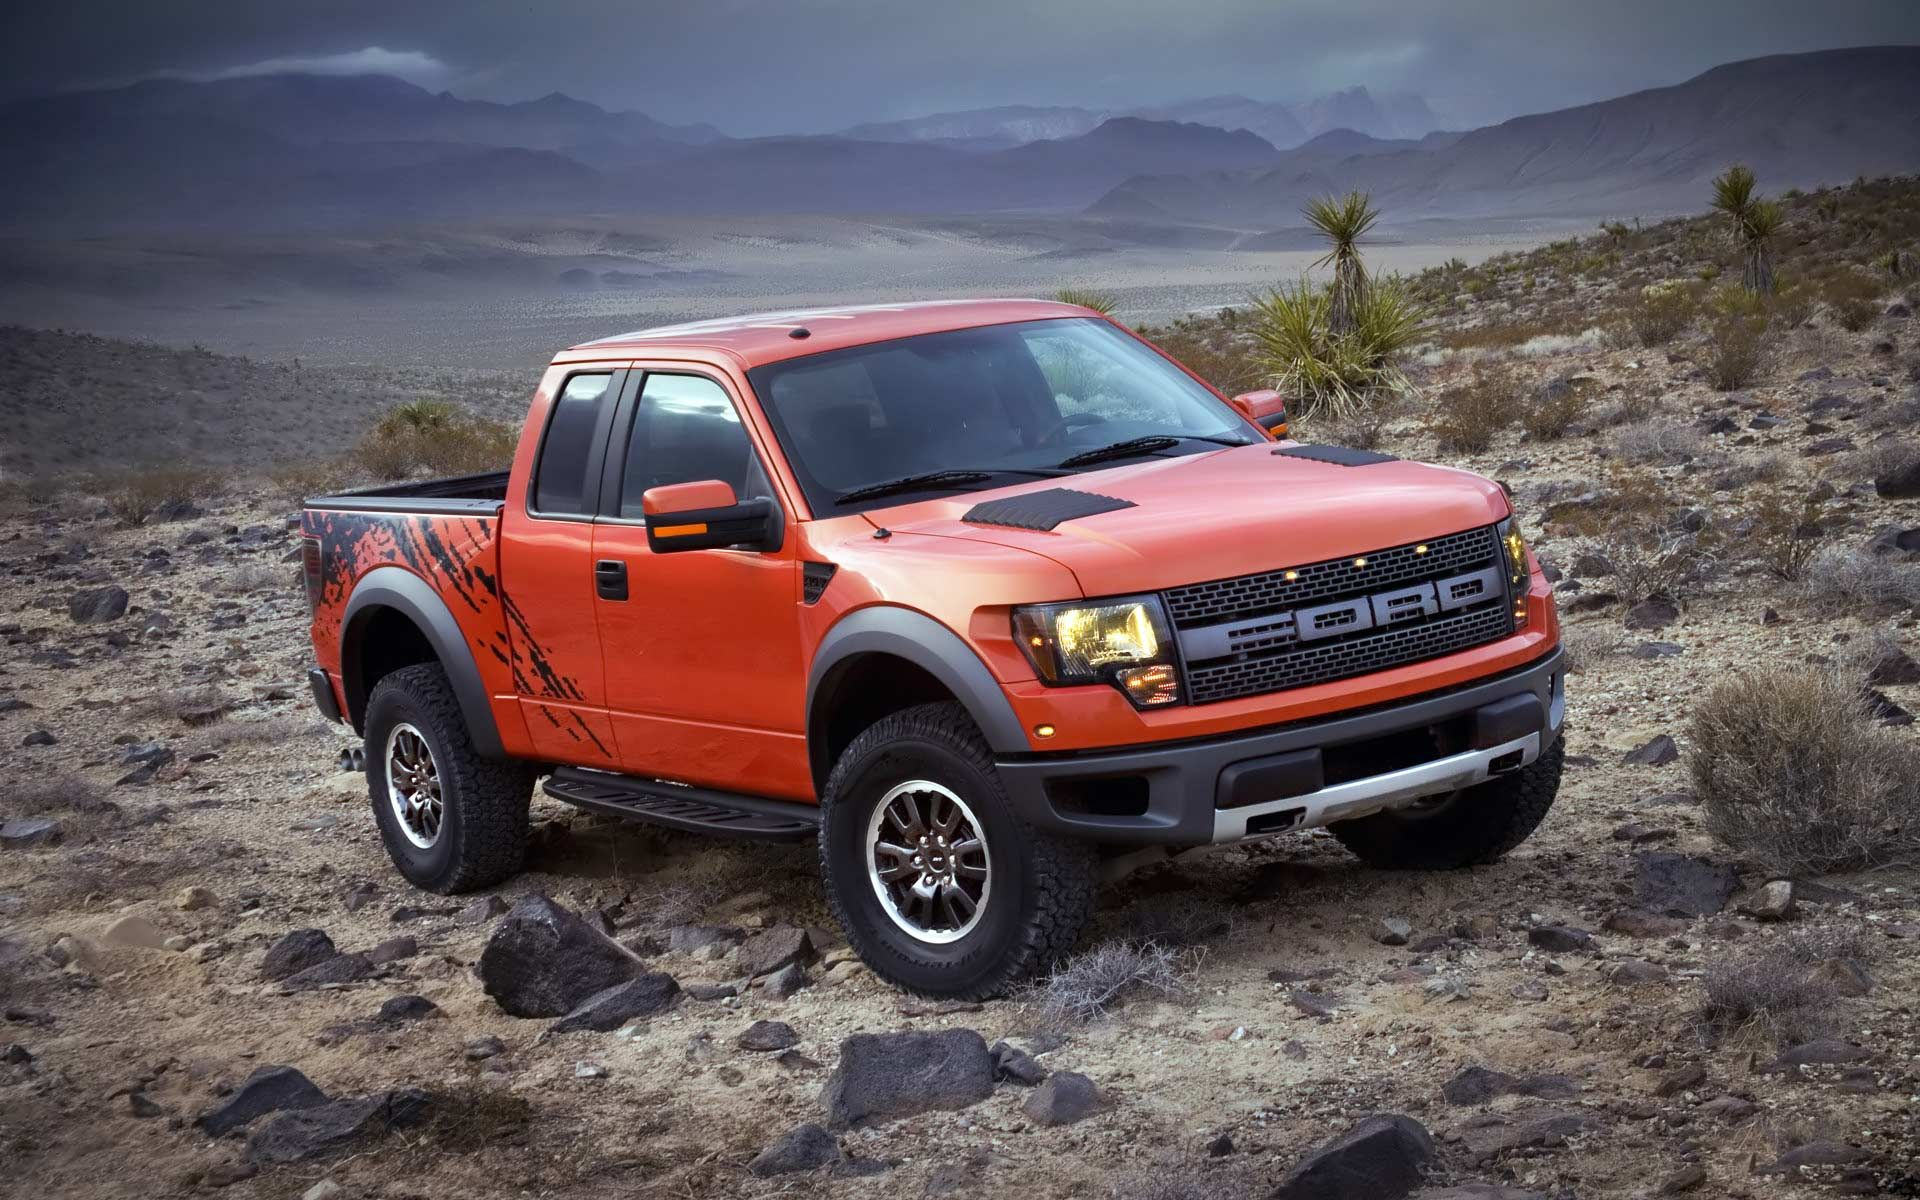 Classic trucks & Fords - orange raptor off-roading | Ford SVT Raptor Trucks ... markmcfarlin.com